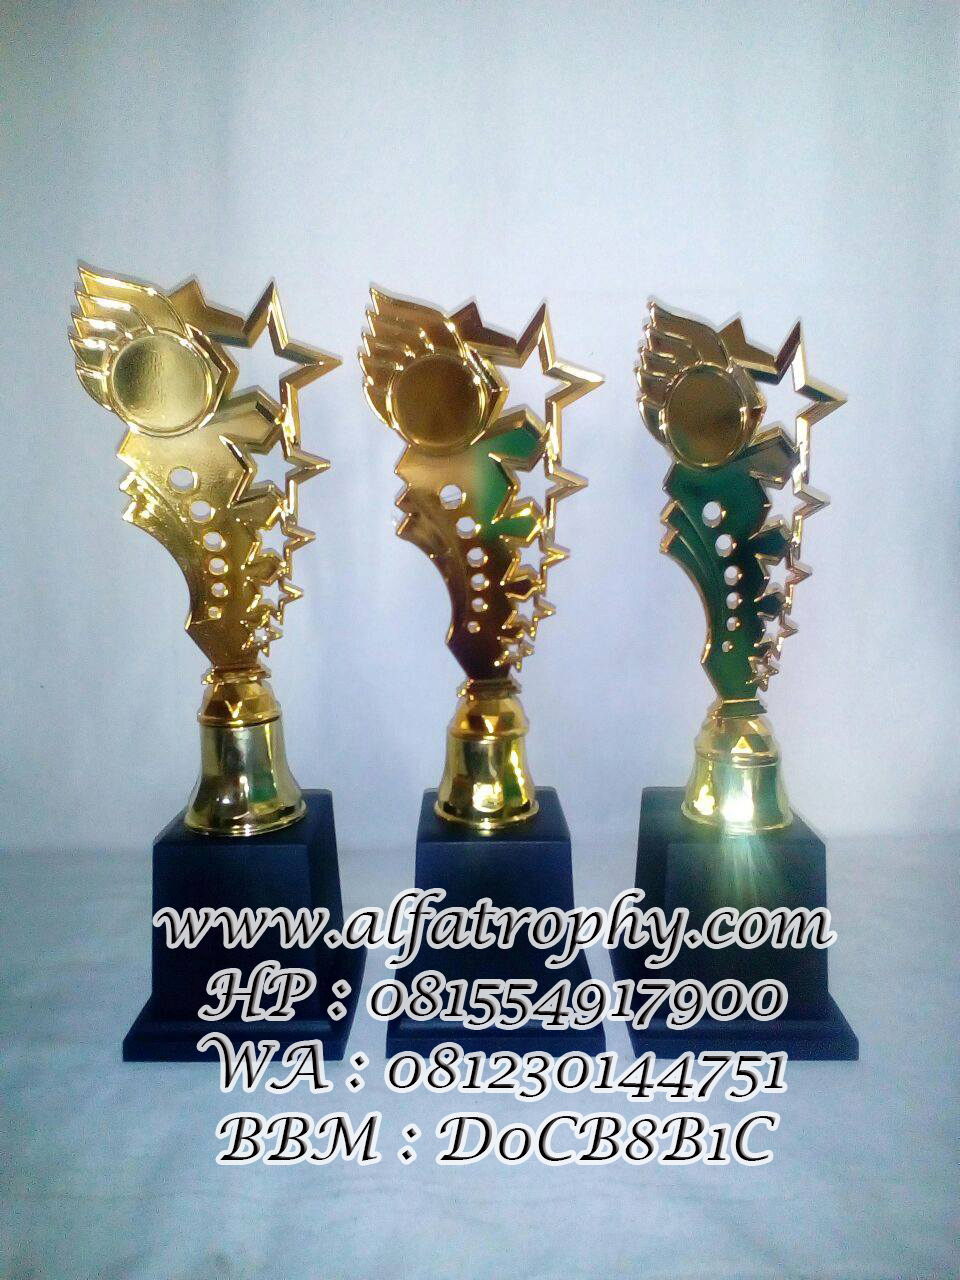 Jual Trophy Plastik | Pusat Piala Trophy